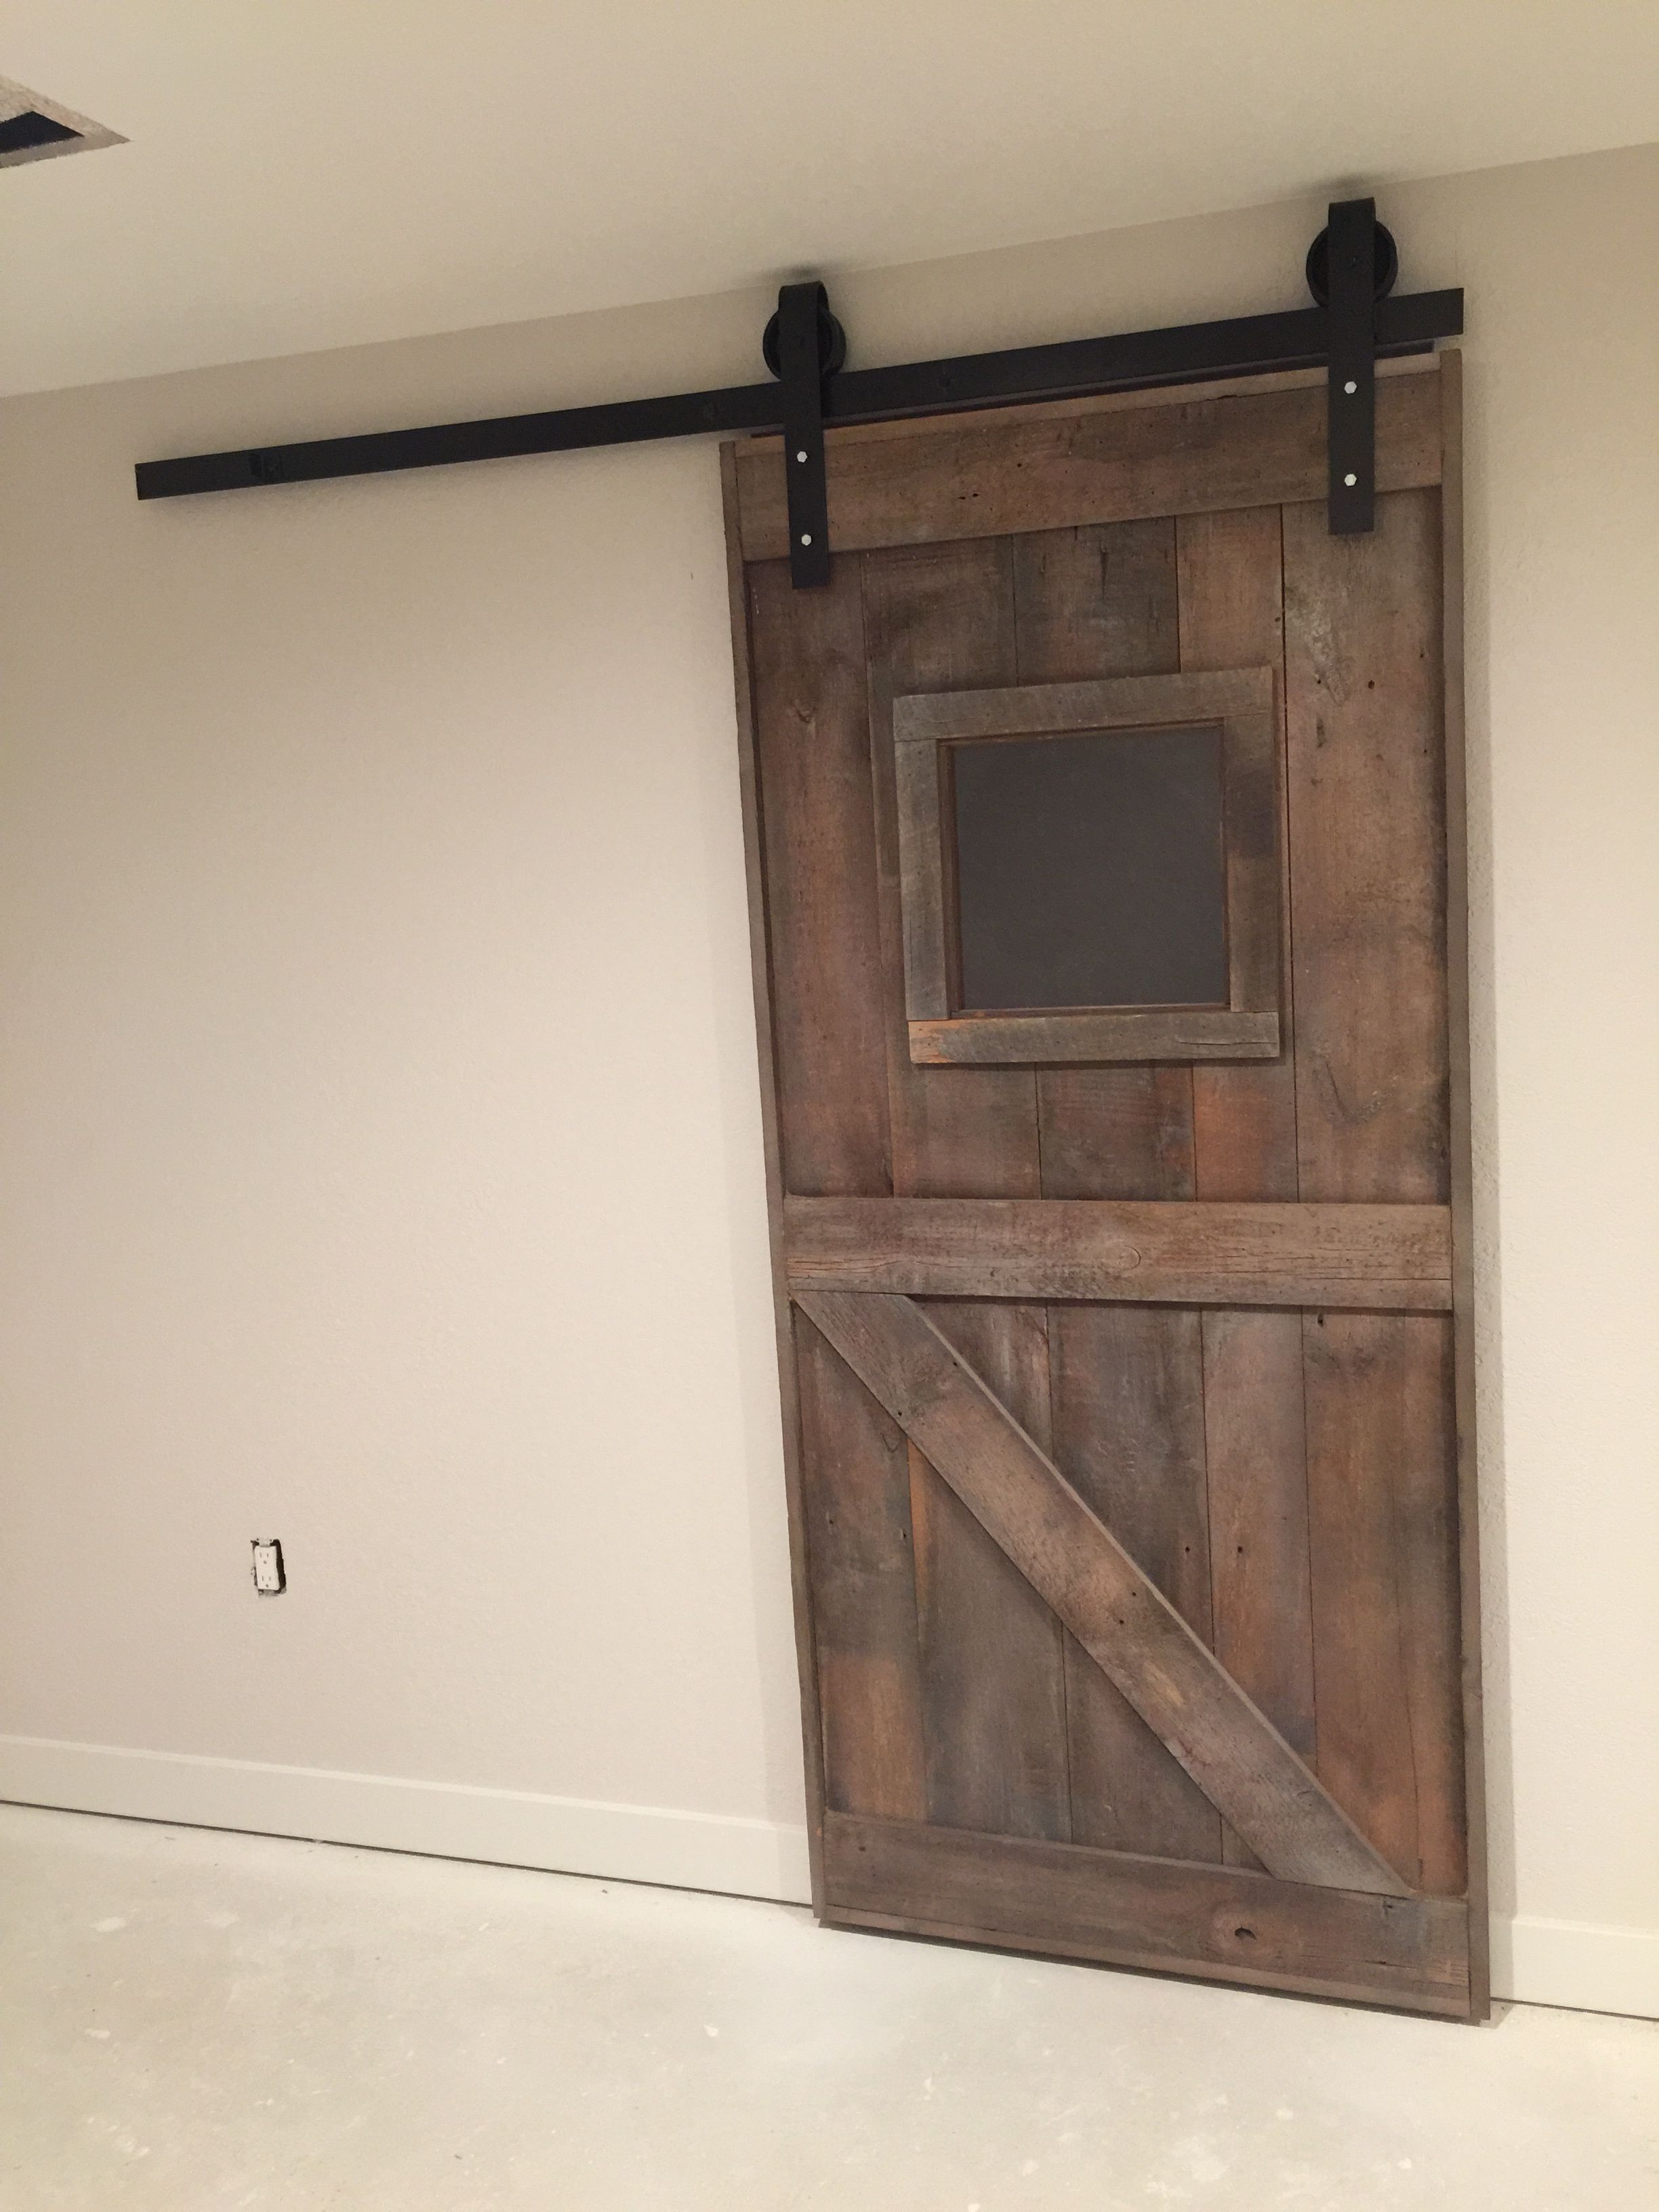 Speakeasy Sliding Barn Door With Traditional Hardware Barn Door Sliding Barn Door Sliding Barn Door Hardware